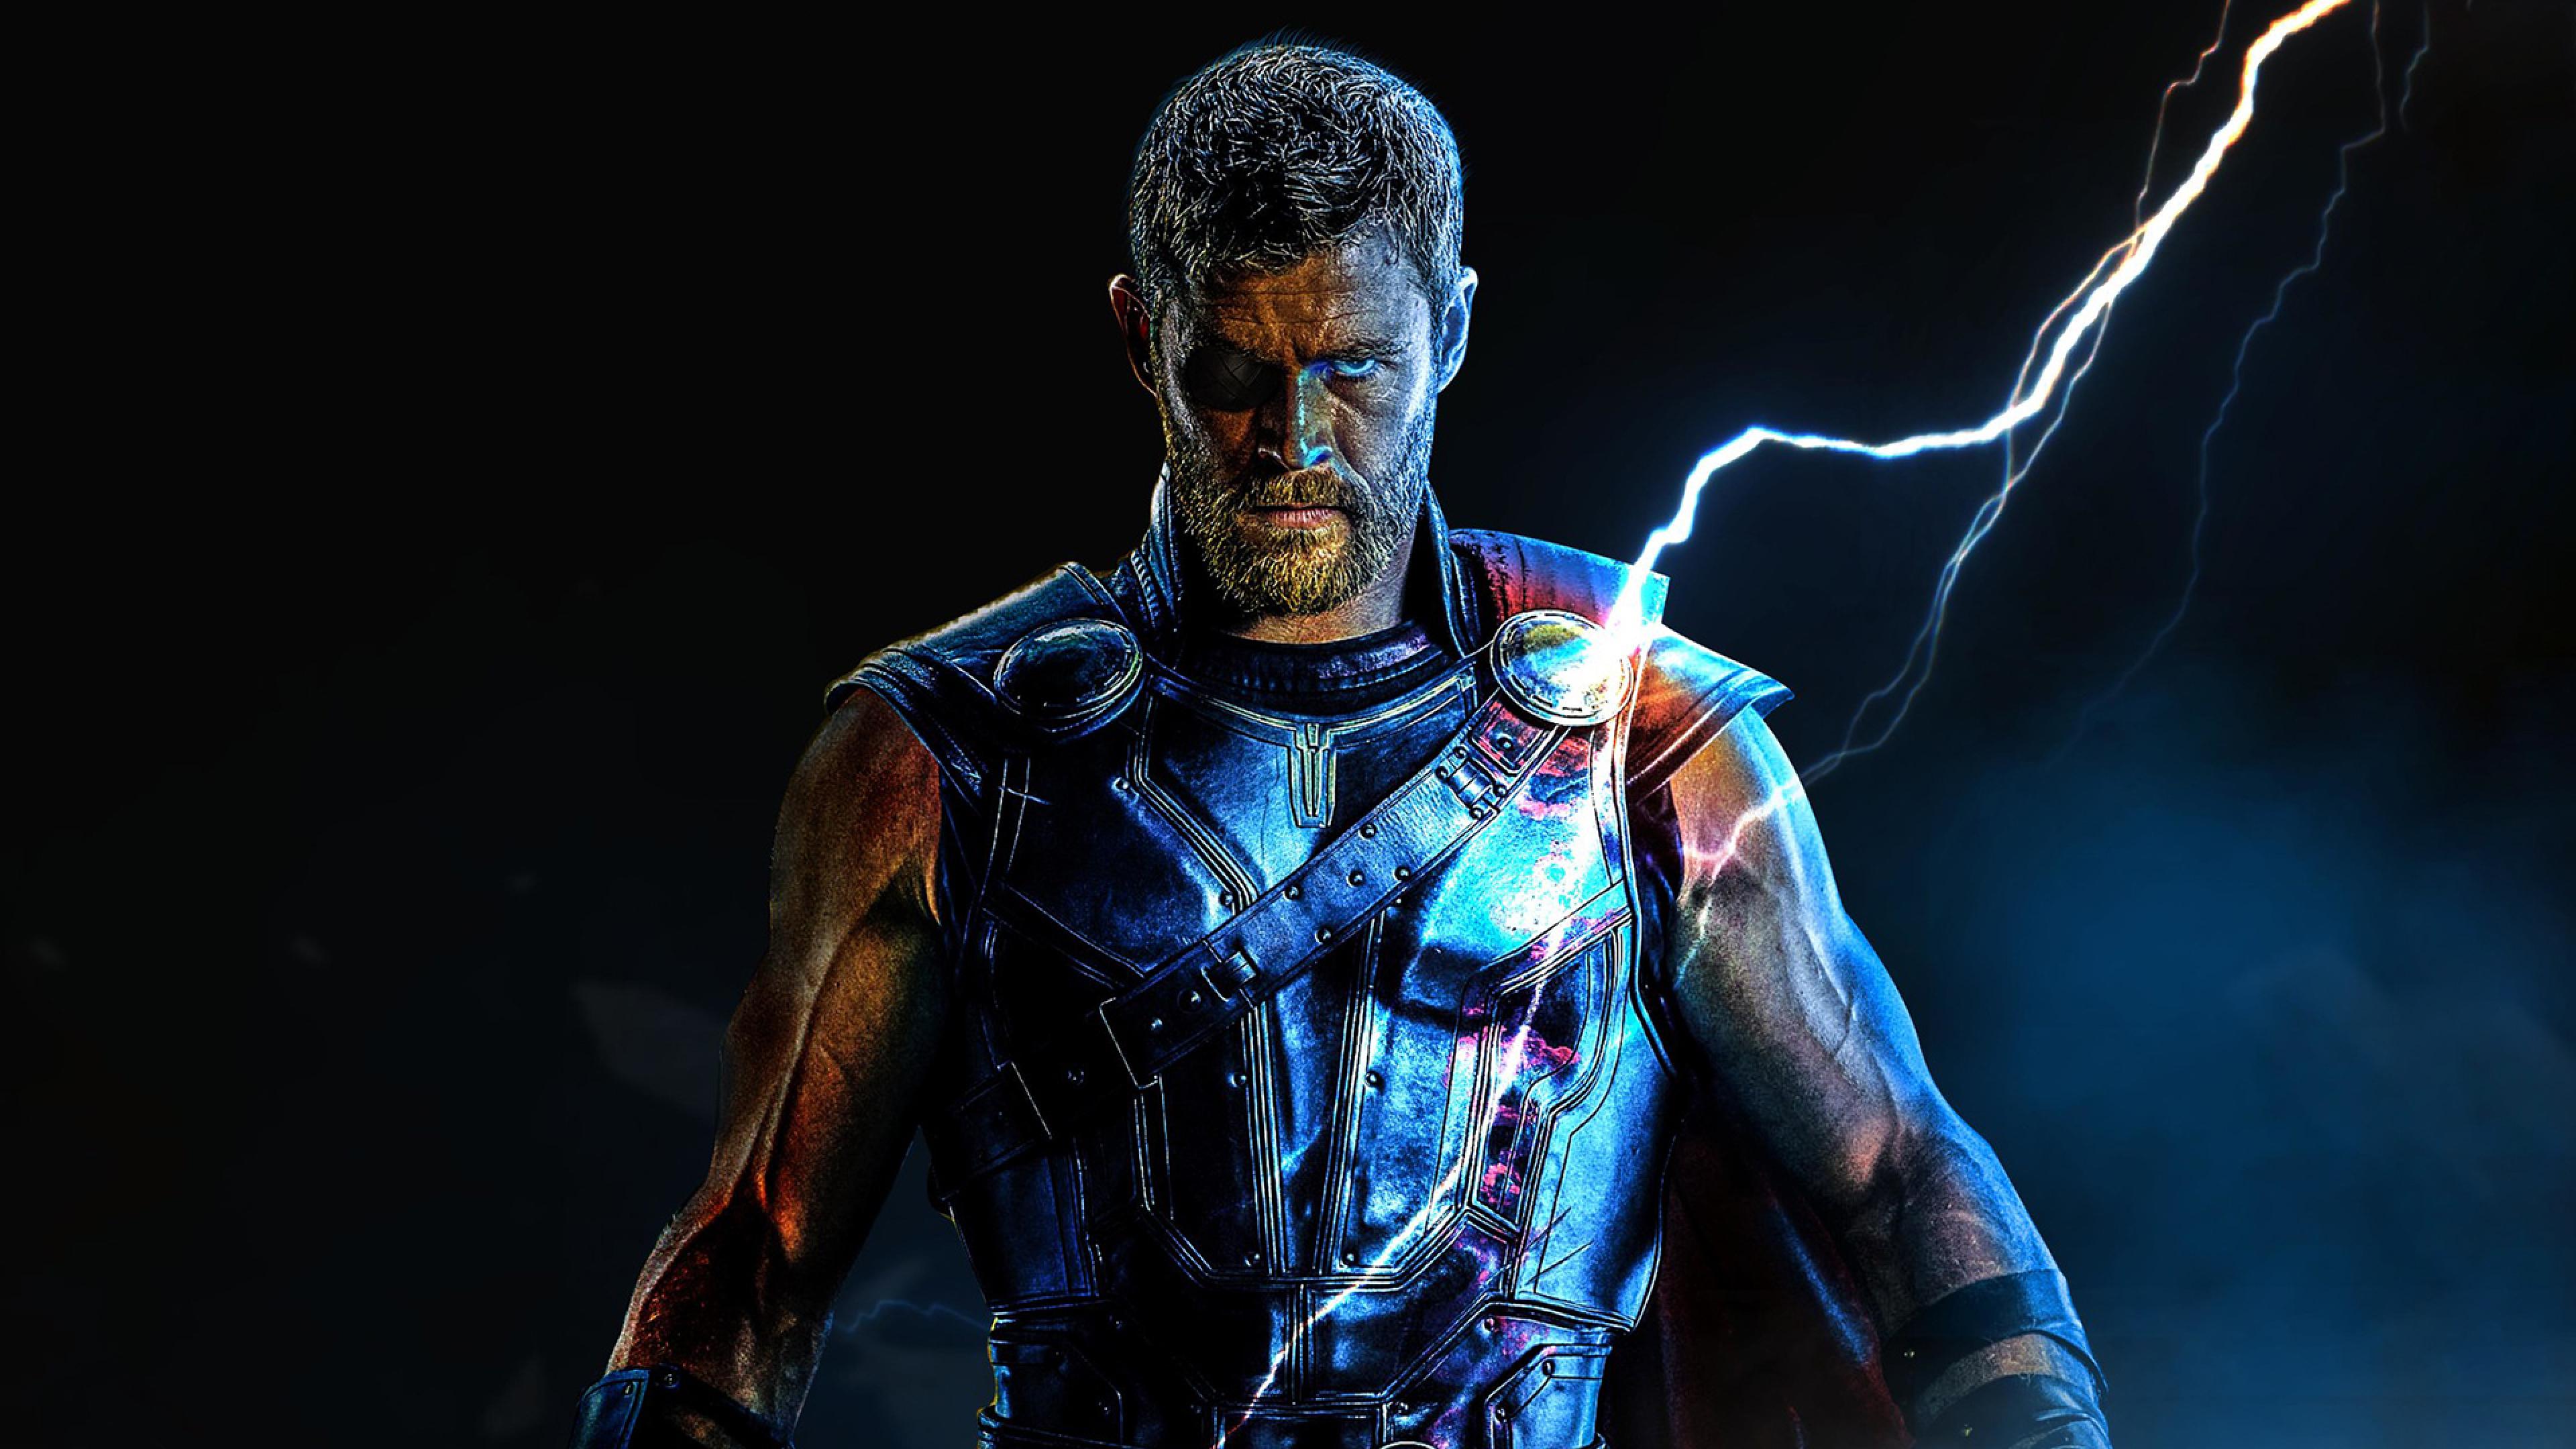 Infinity War Thor Digital Art Full Hd Wallpaper